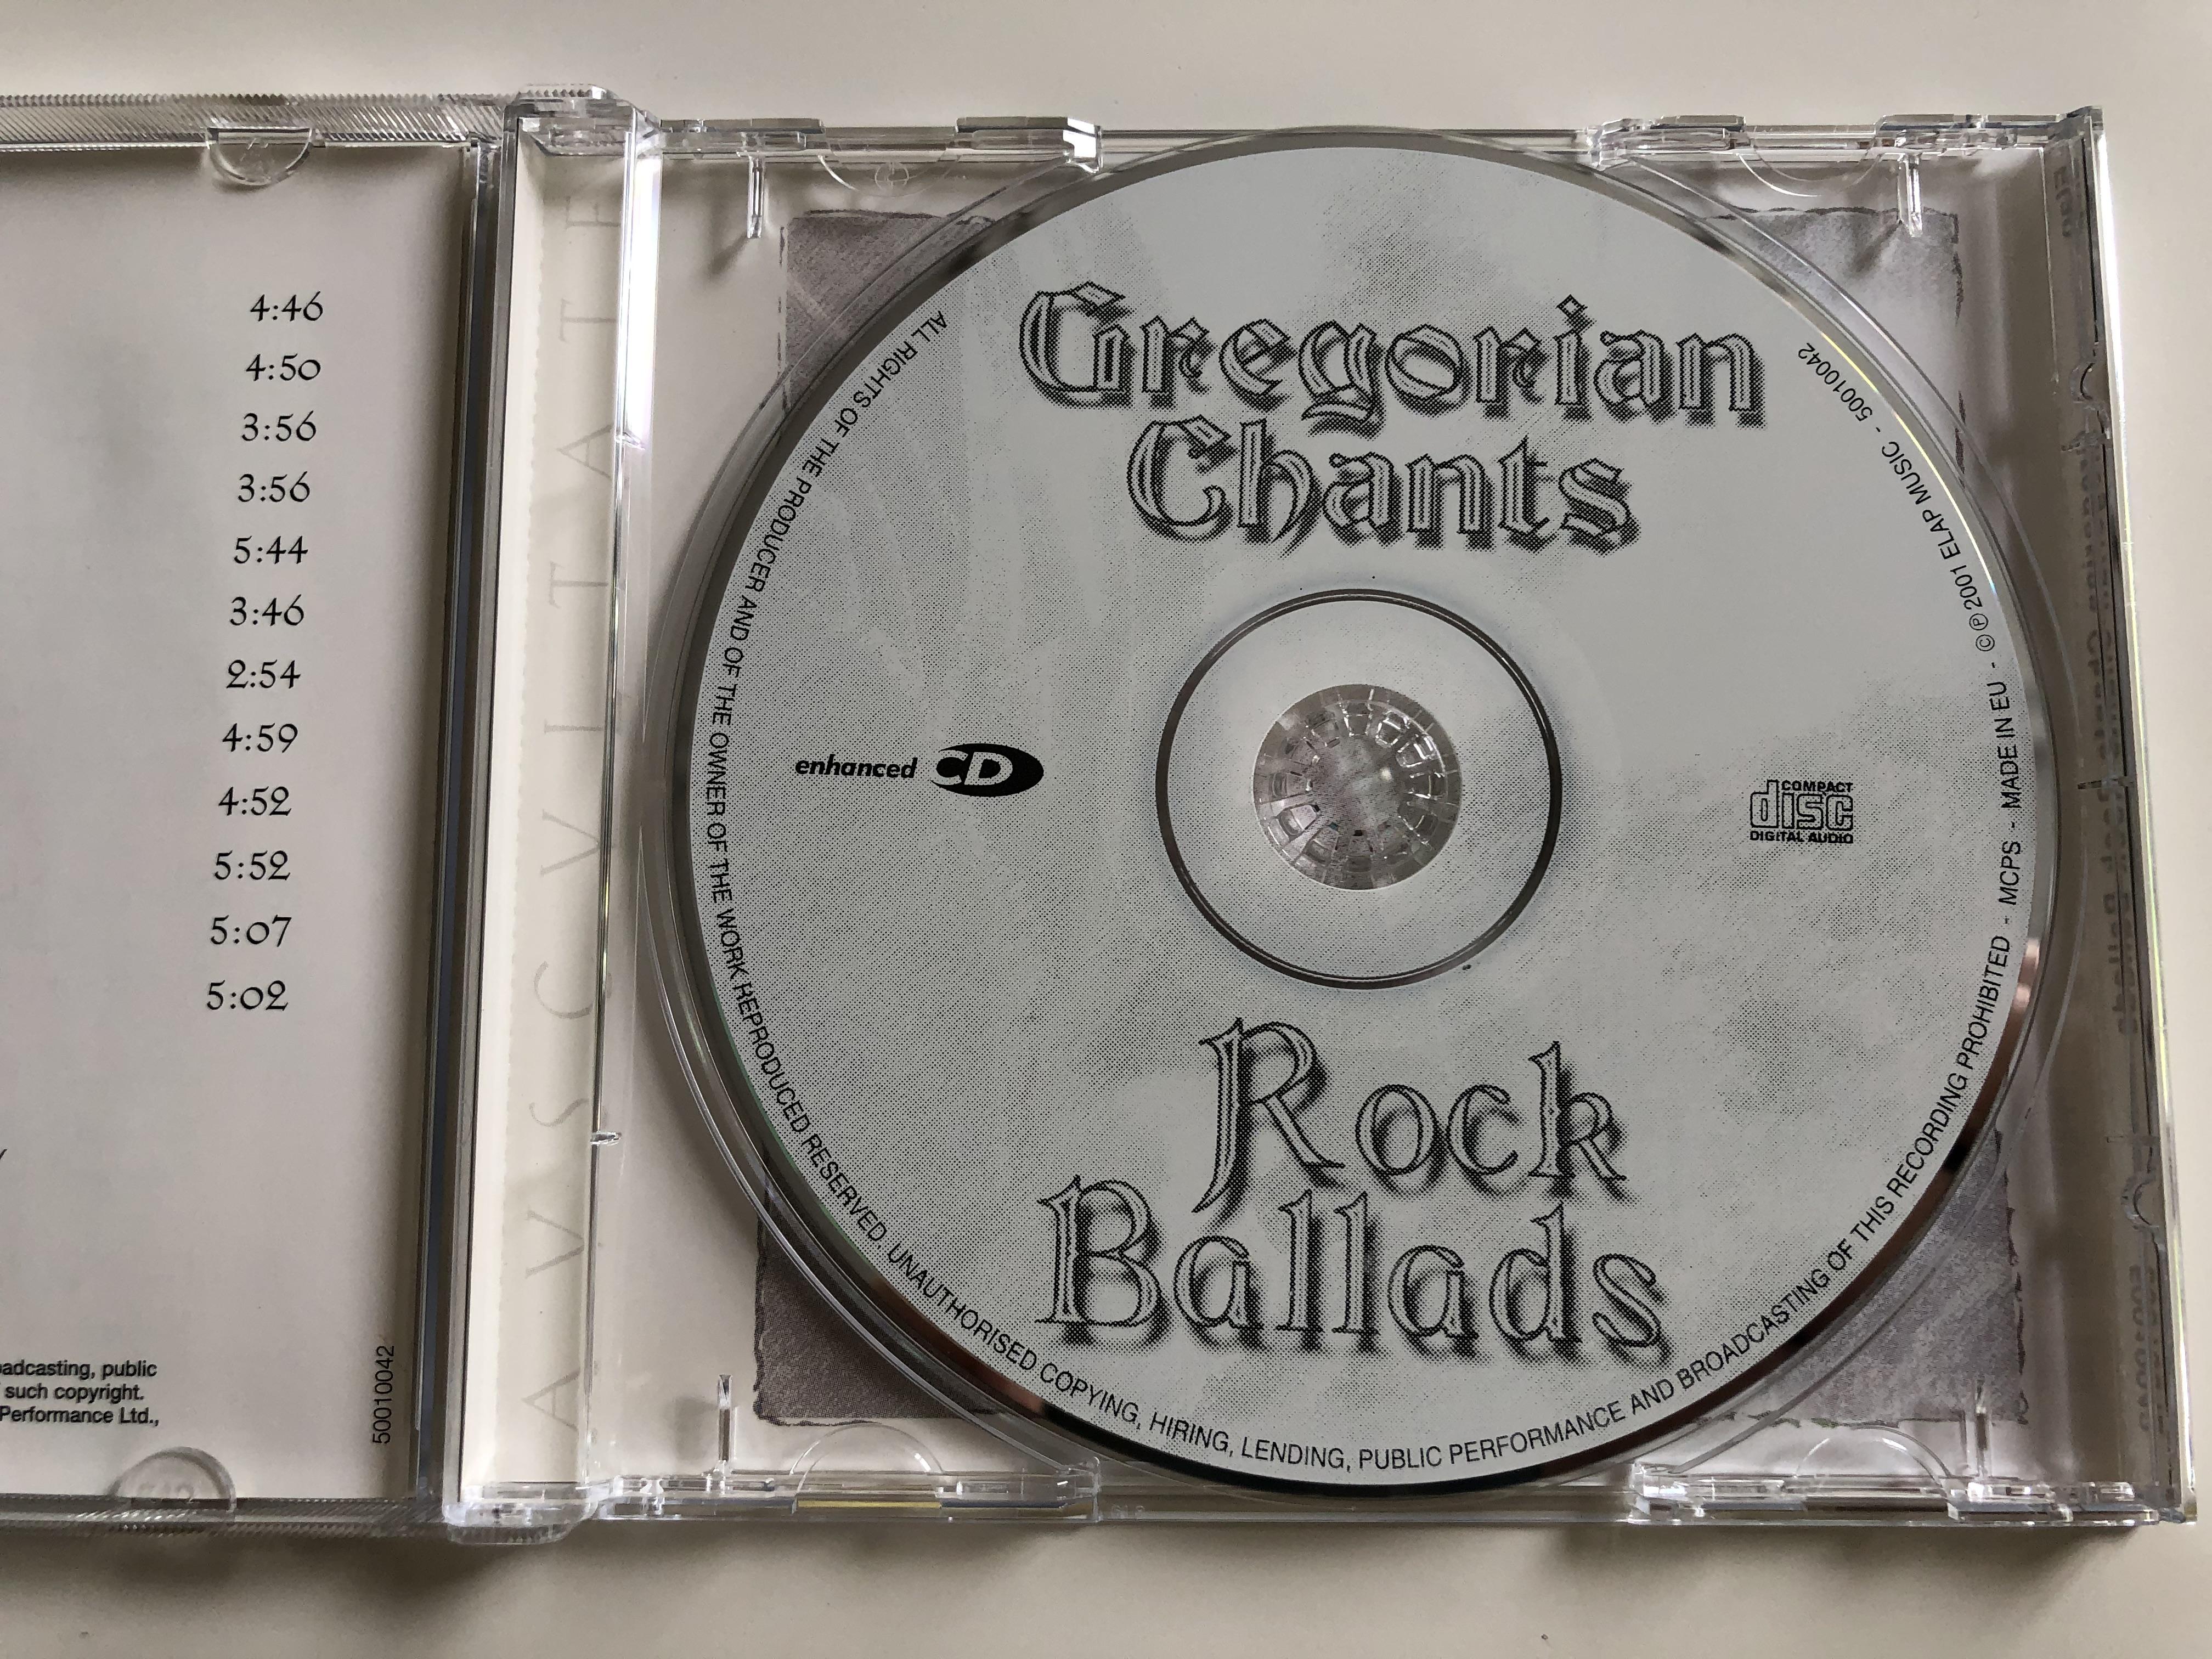 gregorian-chants-rock-ballads-performed-by-avscvltate-enhanced-cd-audio-cd-2001-elap-music-4-.jpg